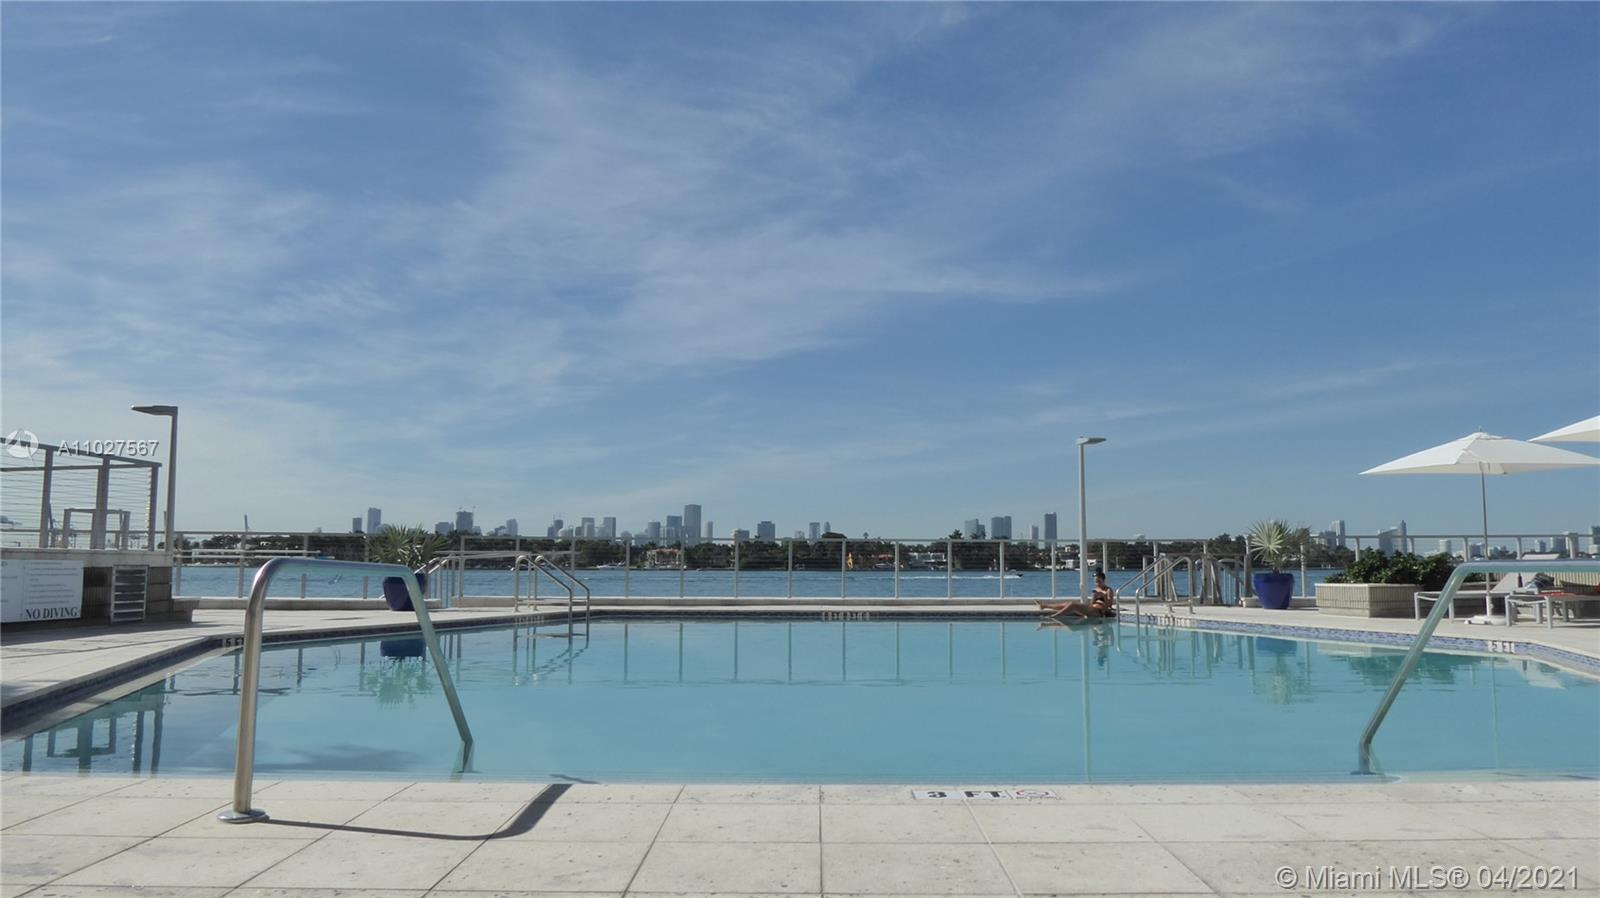 South Bay Club #828 - 800 West Ave #828, Miami Beach, FL 33139